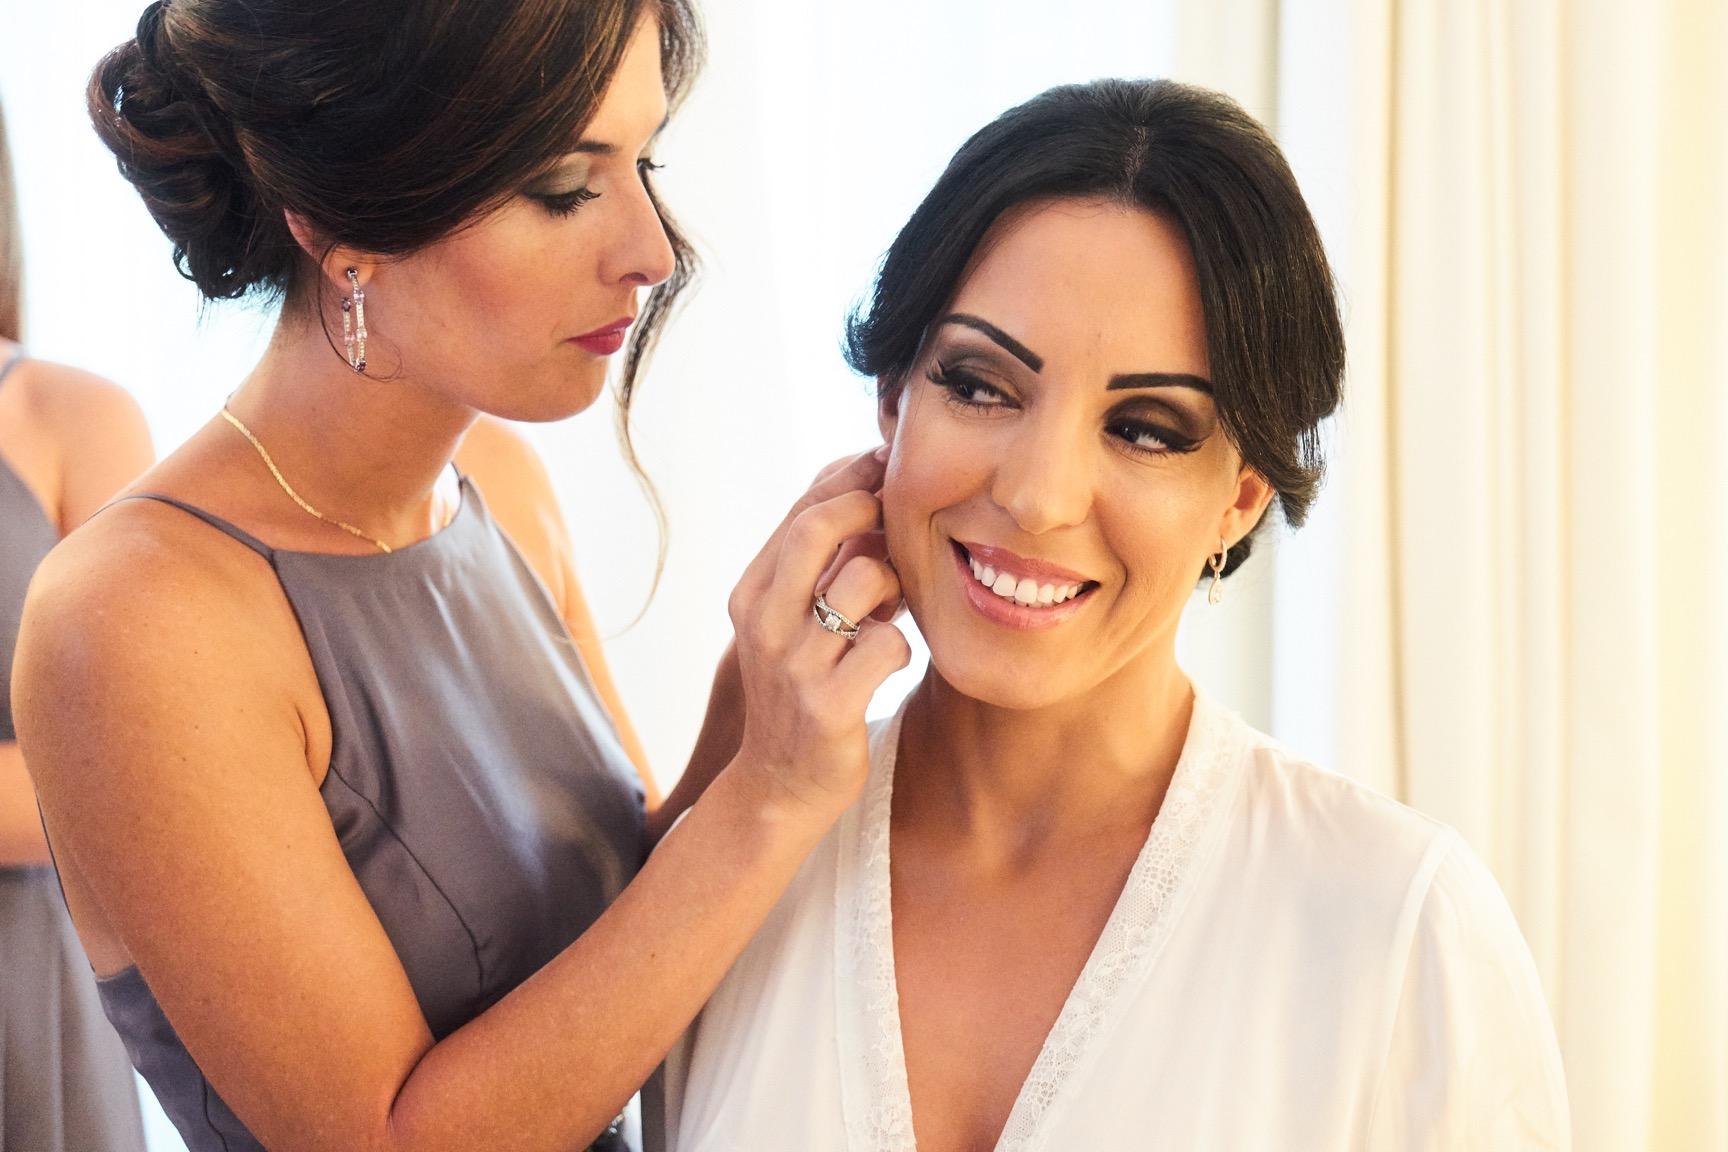 Si-Quiero-Wedding-Planner-By-Sira-Antequera-Bodas-Málaga-Marbella-Miami- Mariam-Guillermo-2